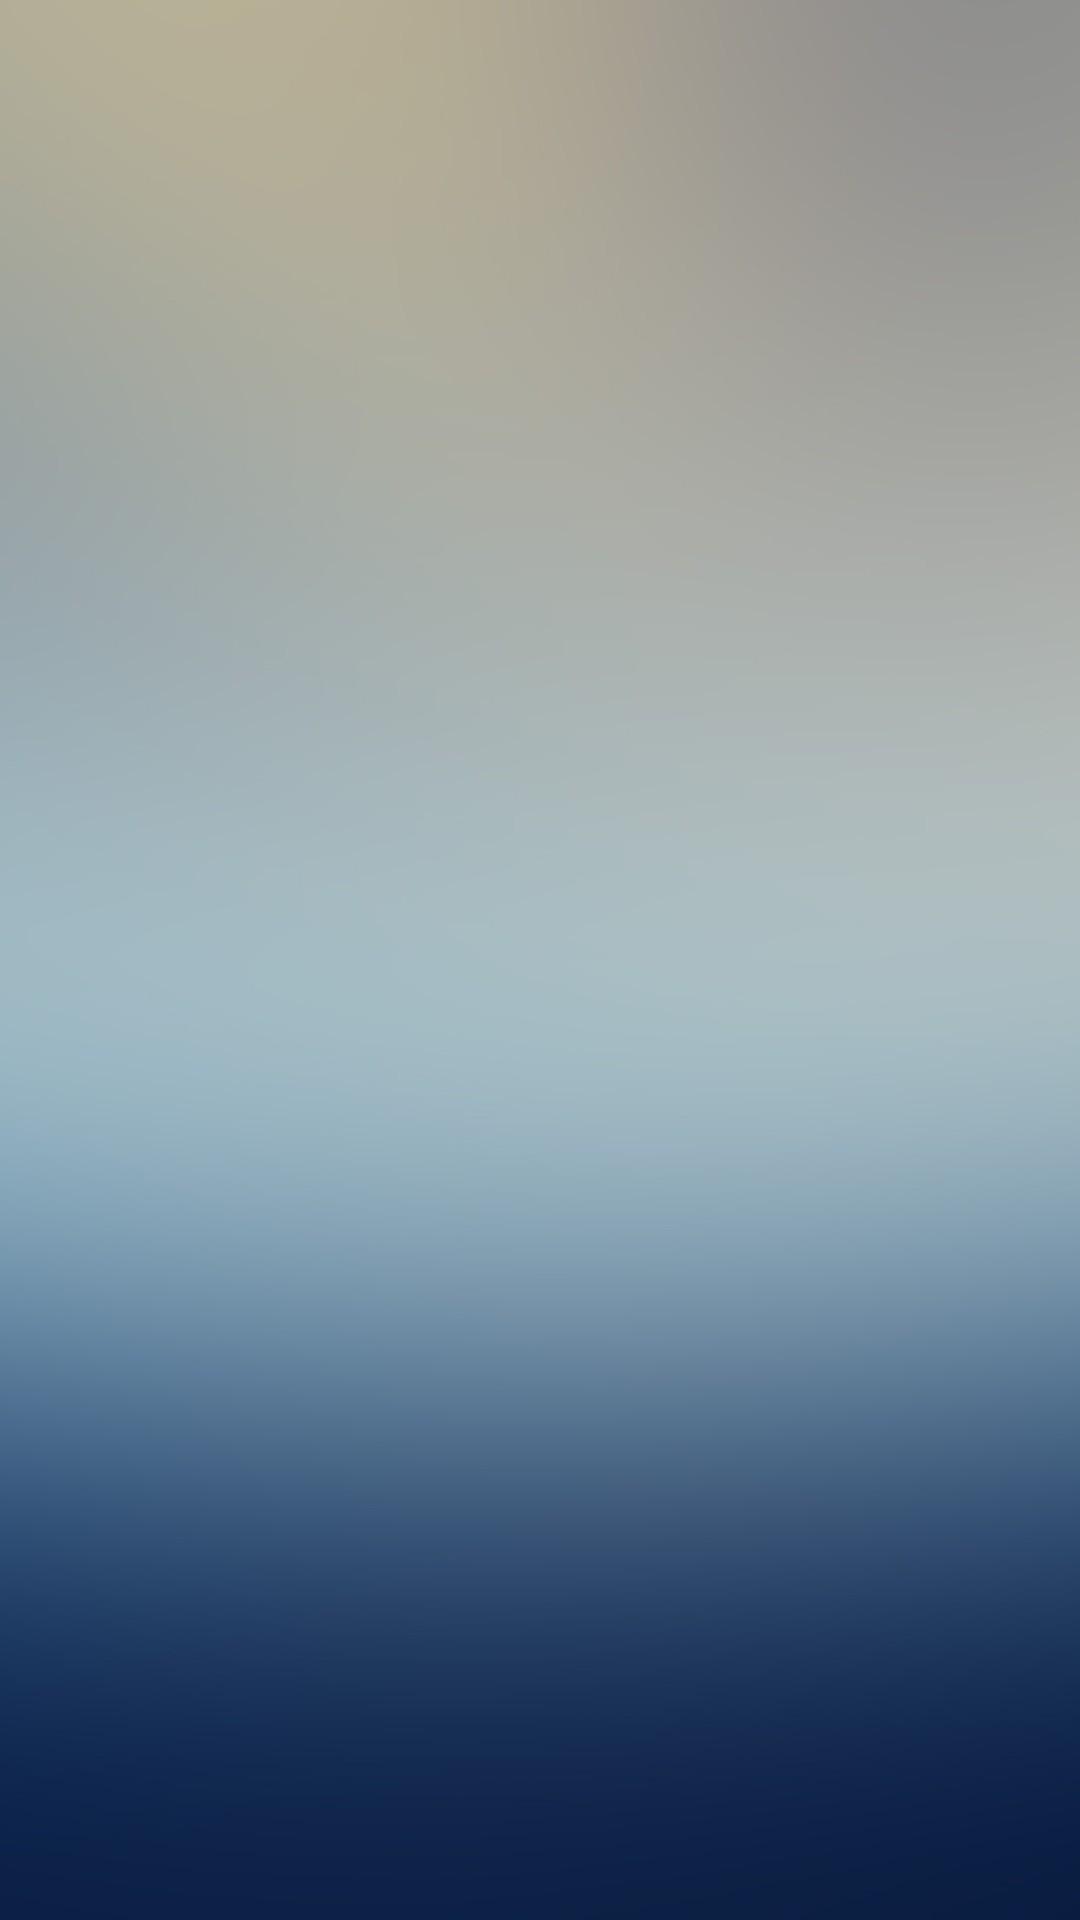 Earth On Space Blue Gradation Blur #iPhone #6 #plus #wallpaper